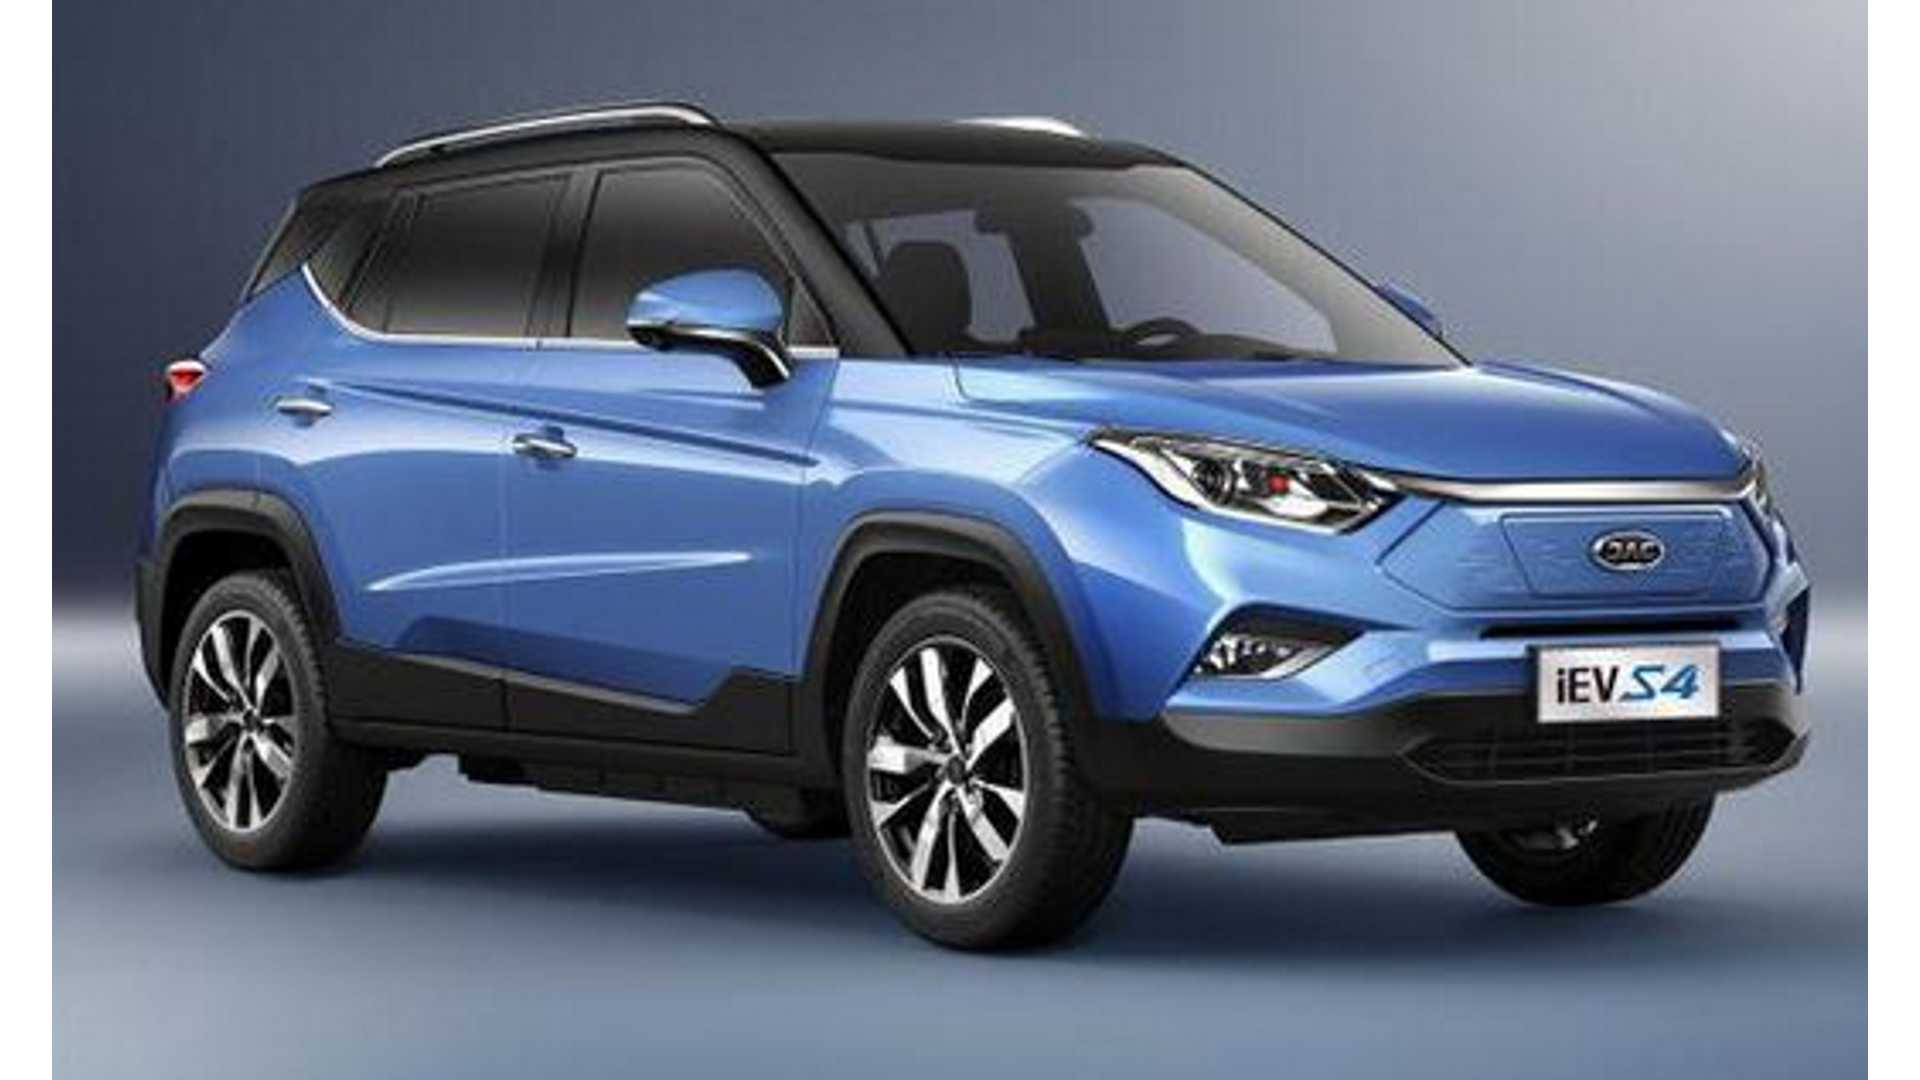 China's JAC Motors Reveals Plans For Several New EVs